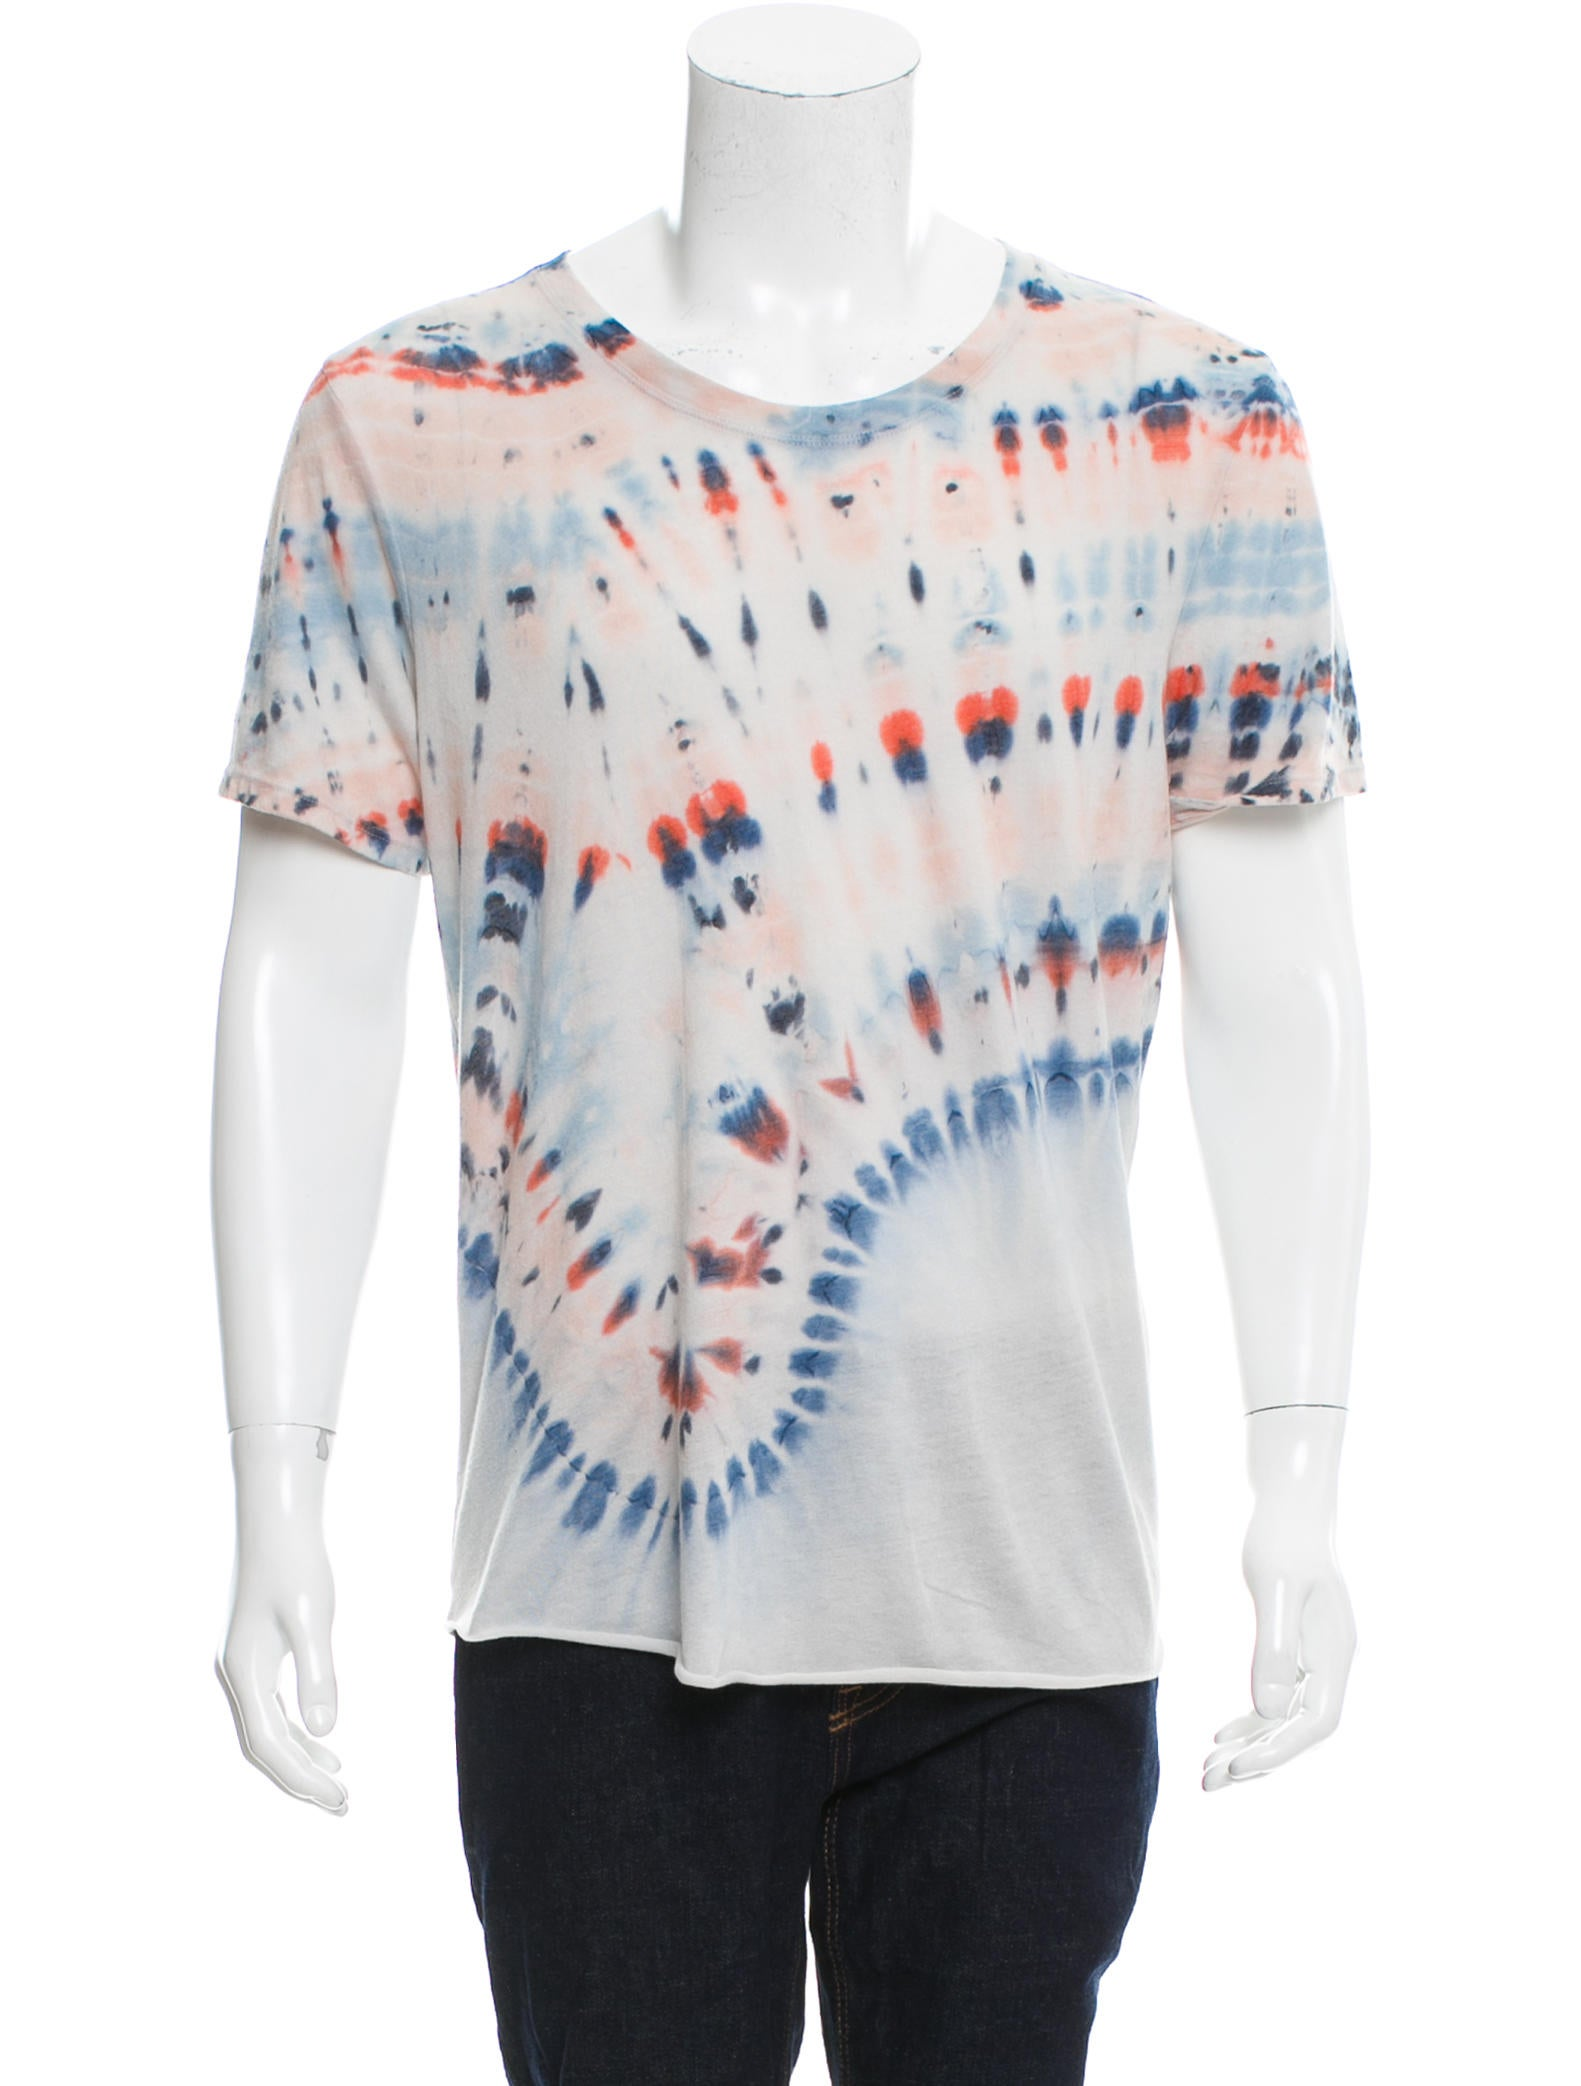 raquel allegra tie dye crew neck t shirt w tags